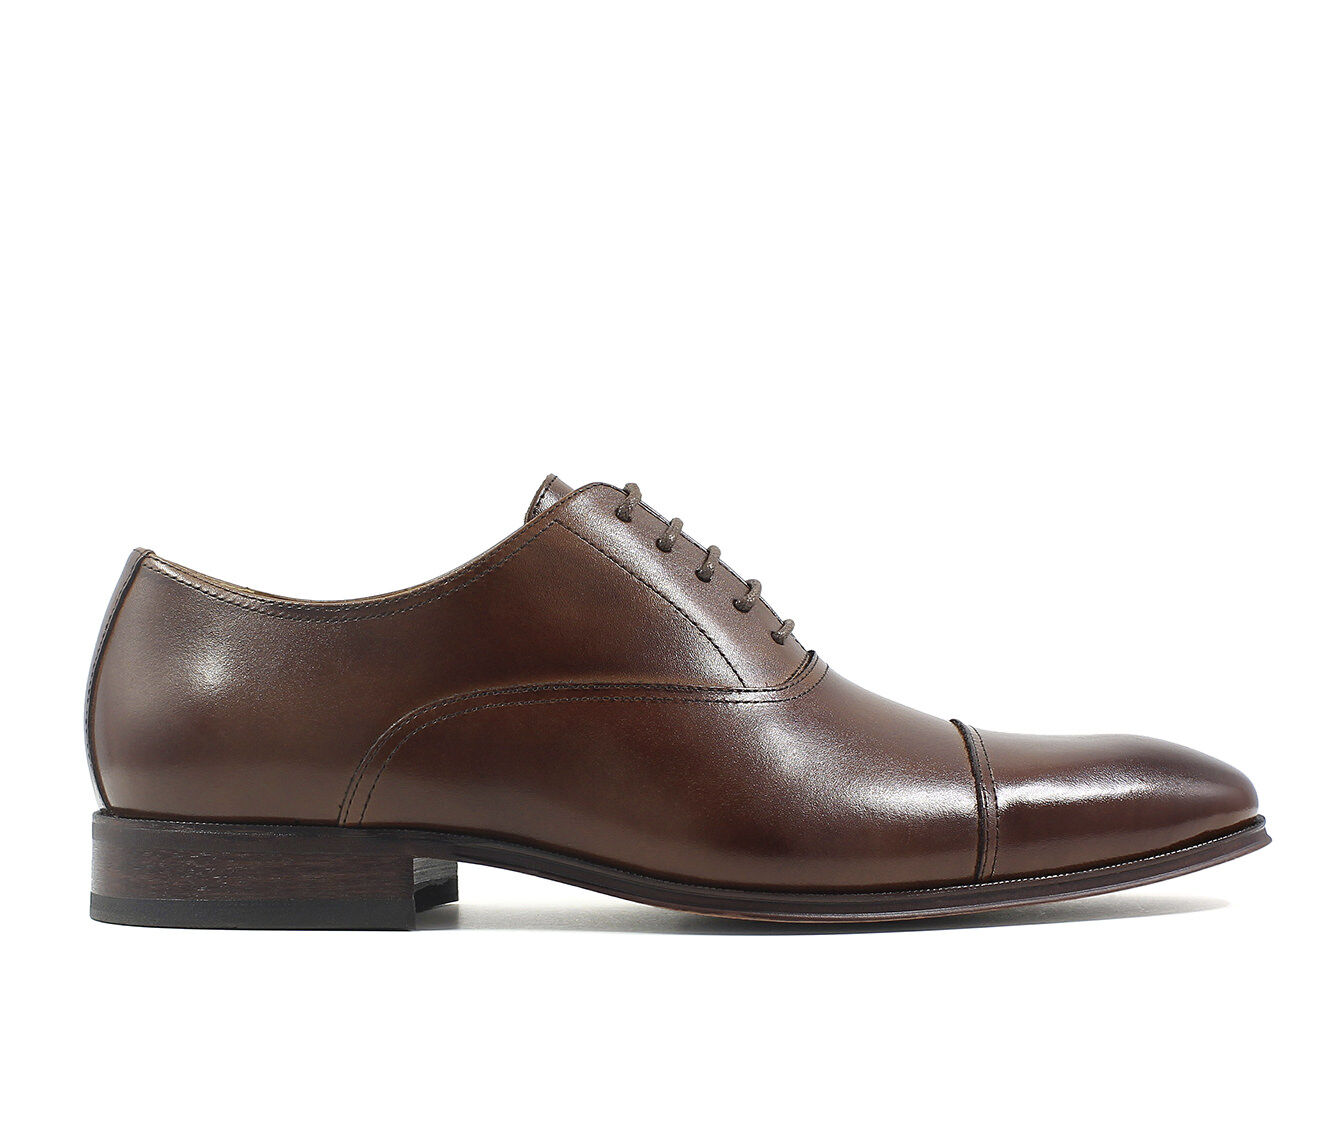 Men's Florsheim Corbetta Cap Toe Oxford Dress Shoes Cognac